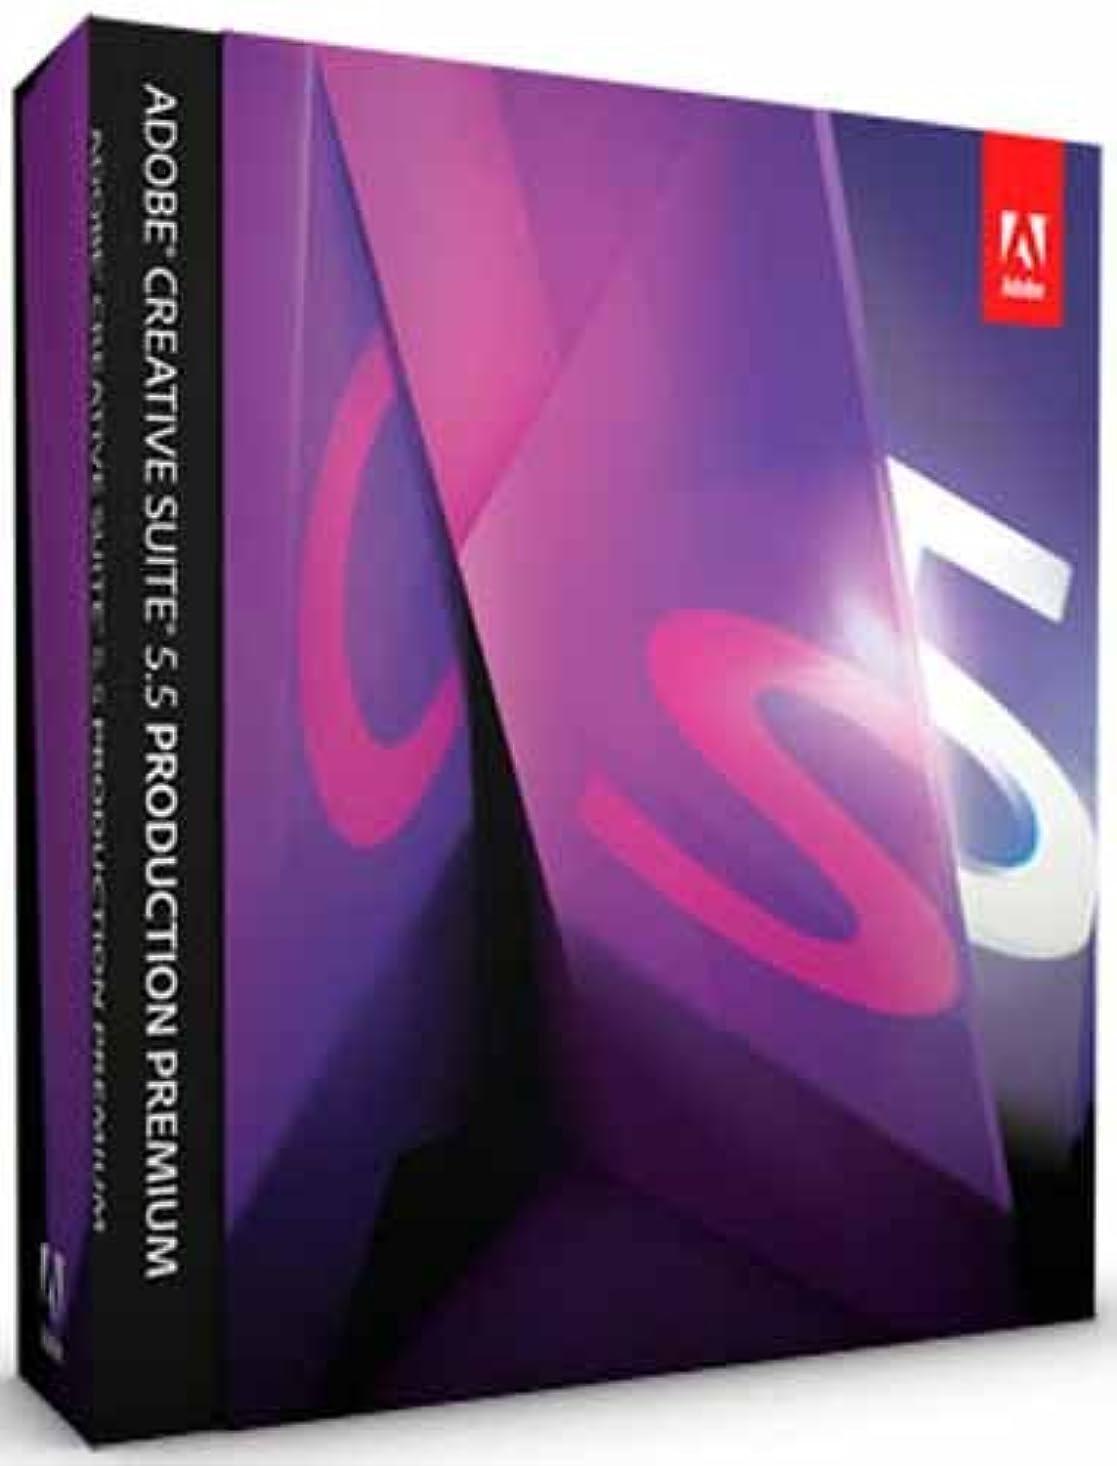 Adobe Creative Suite 5.5 Production Premium Windows版 (旧製品)